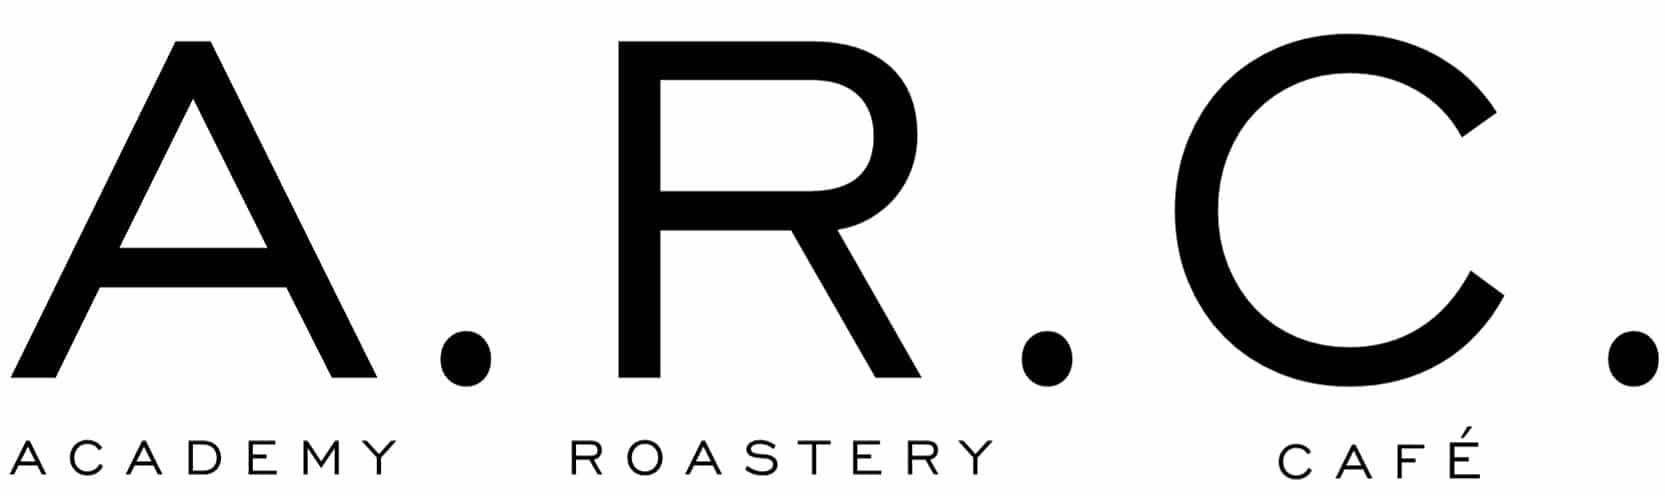 A.R.C. typography logo